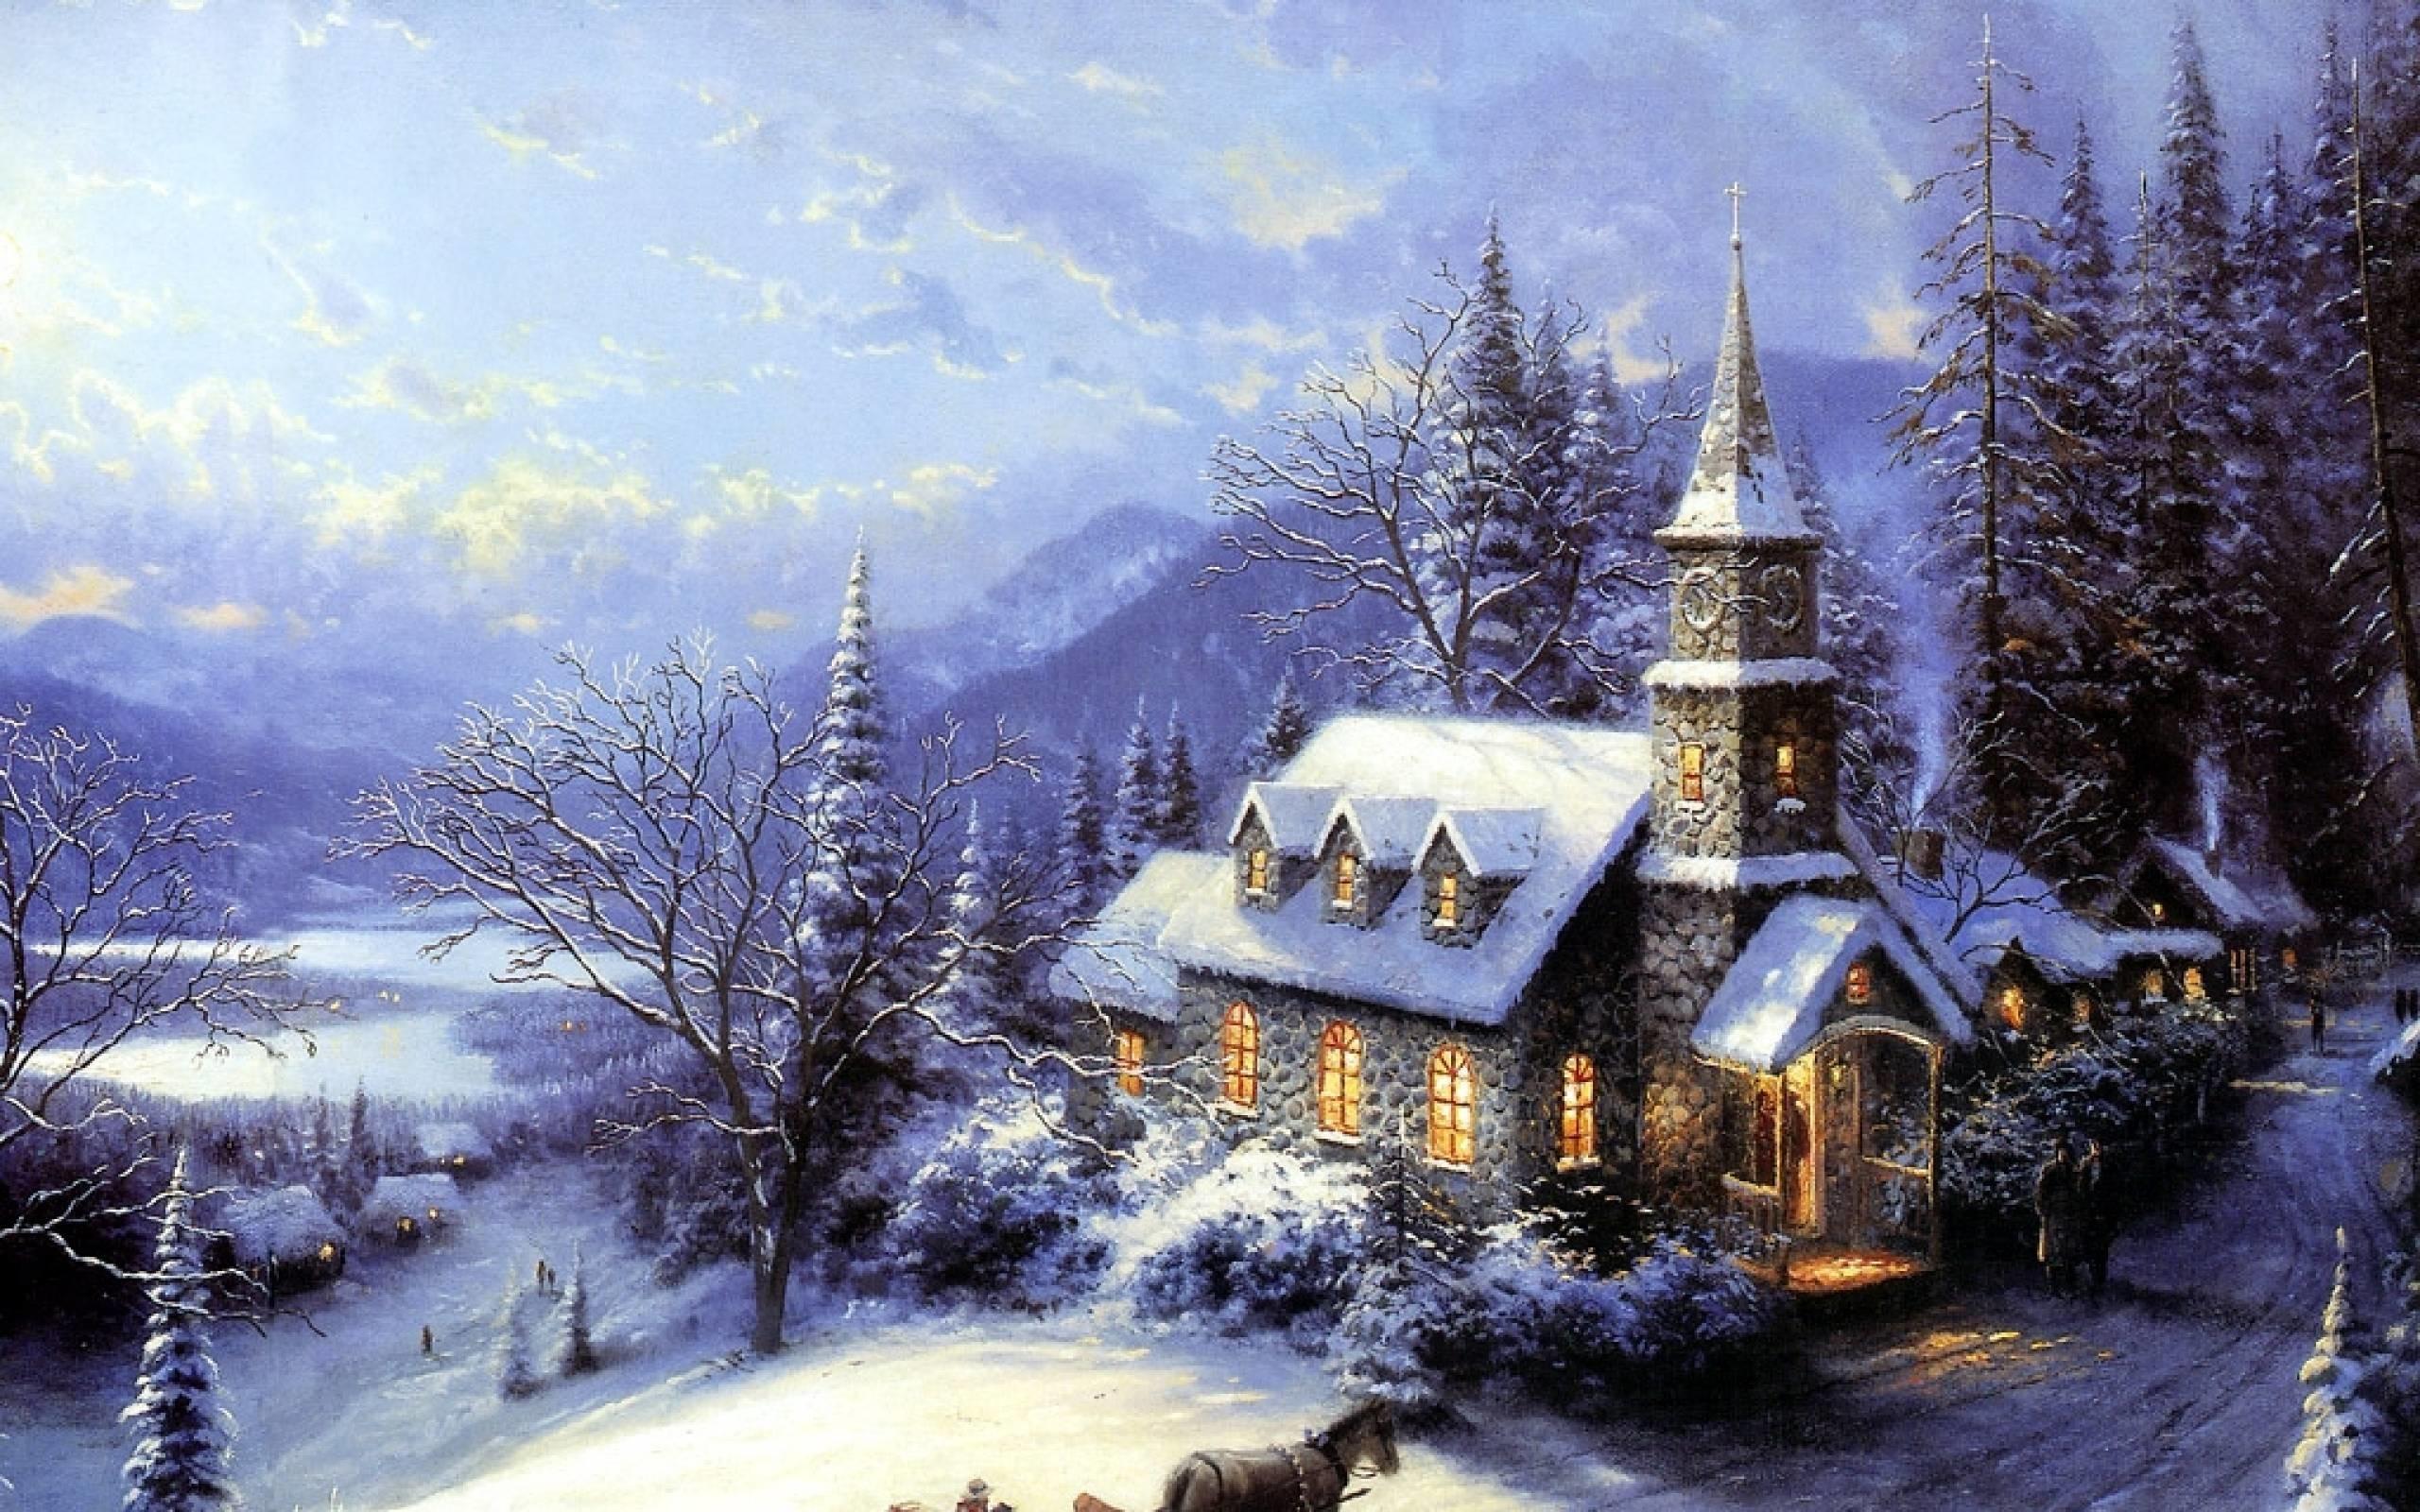 Xmas Stuff For > Thomas Kinkade Christmas Tree Wallpaper